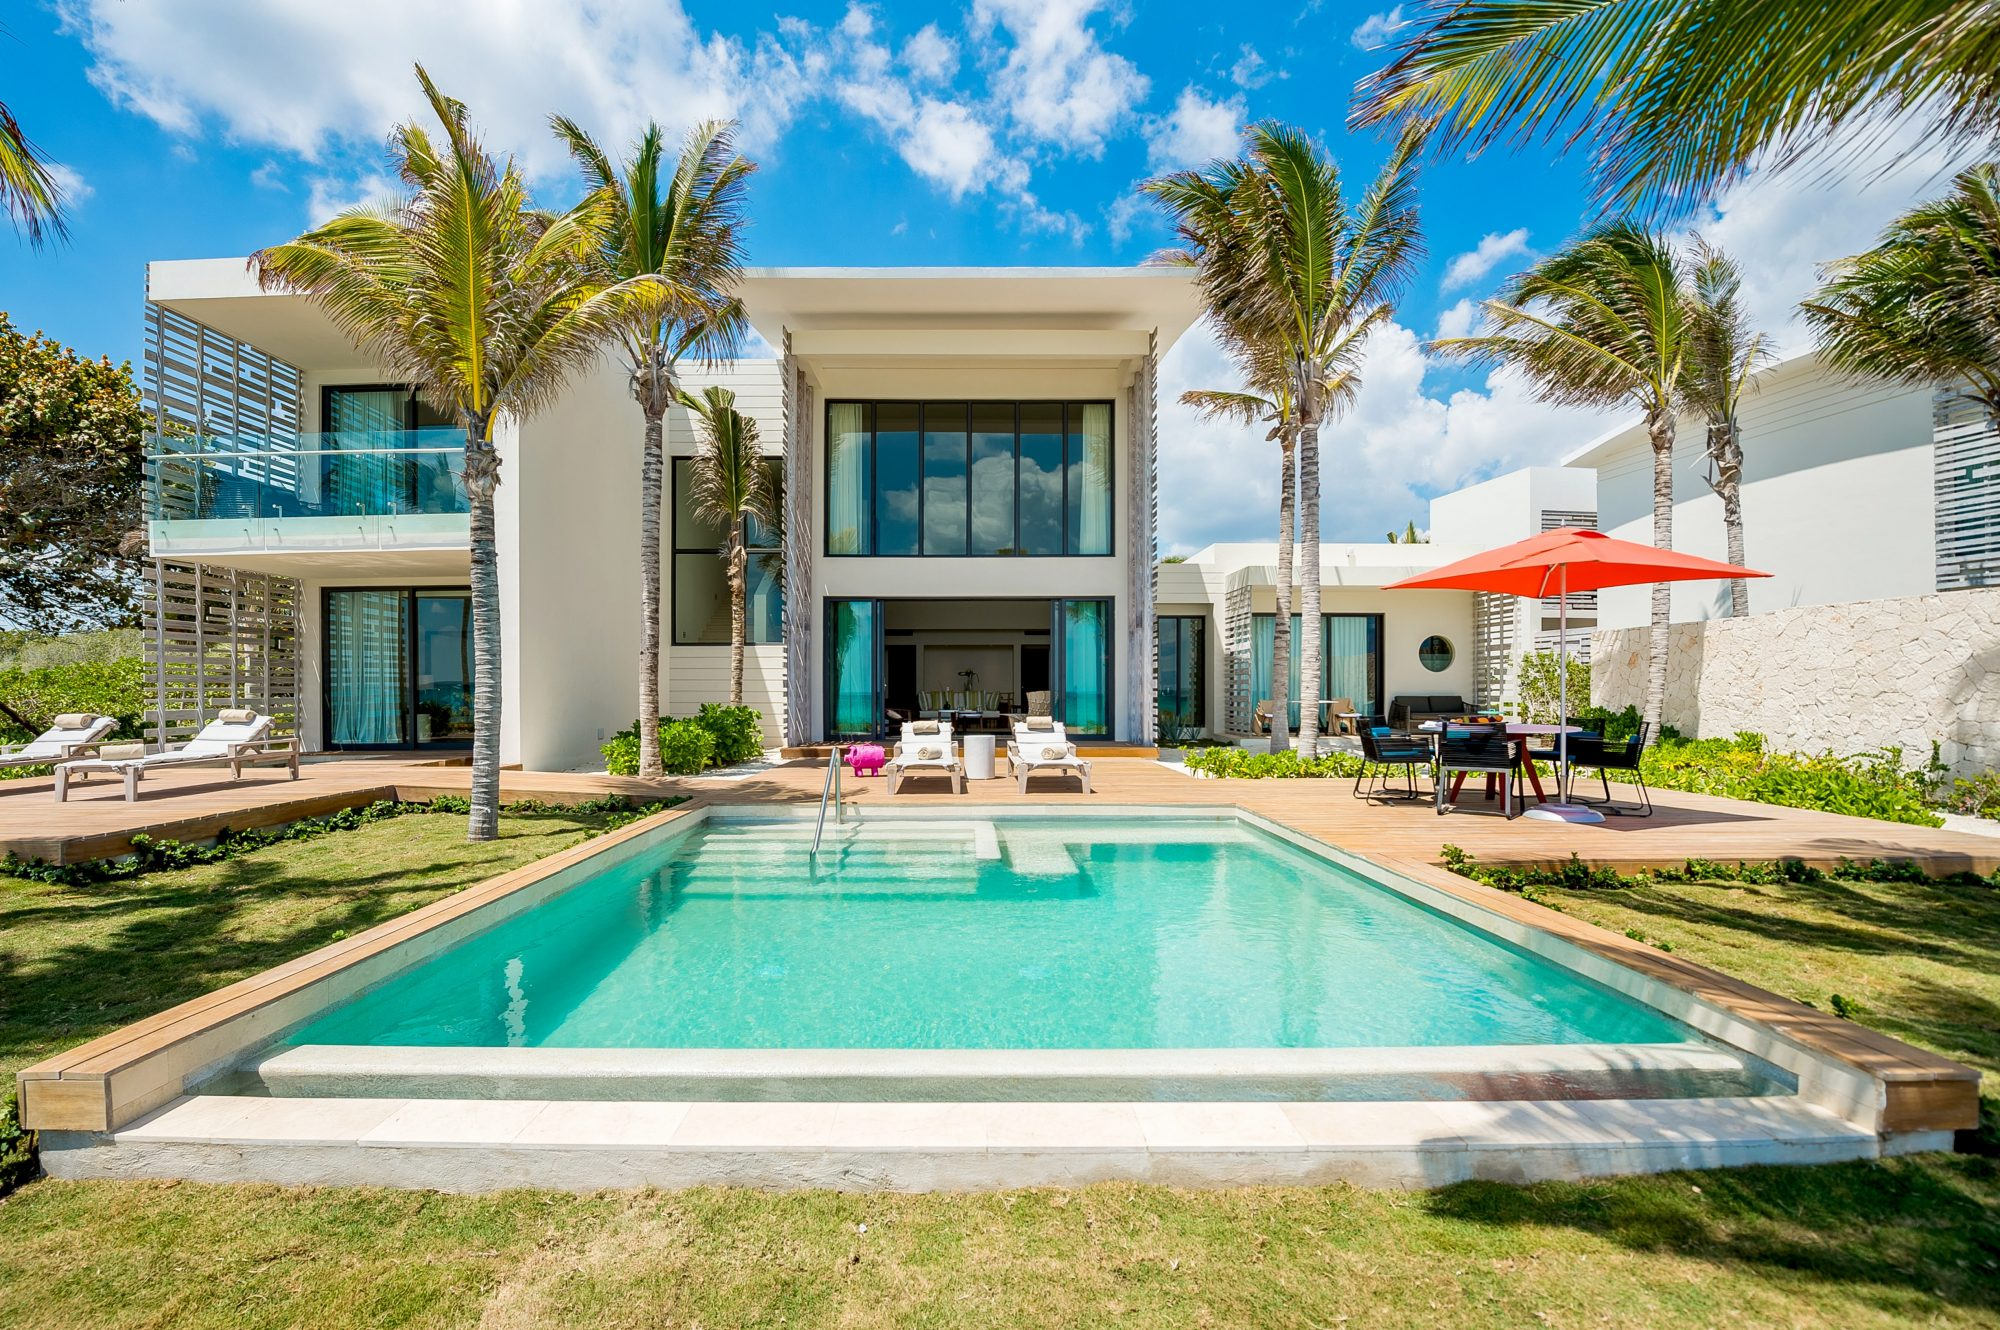 Andaz-Mayakoba-Presidential-Suite-Terrace-View-e1499805937875